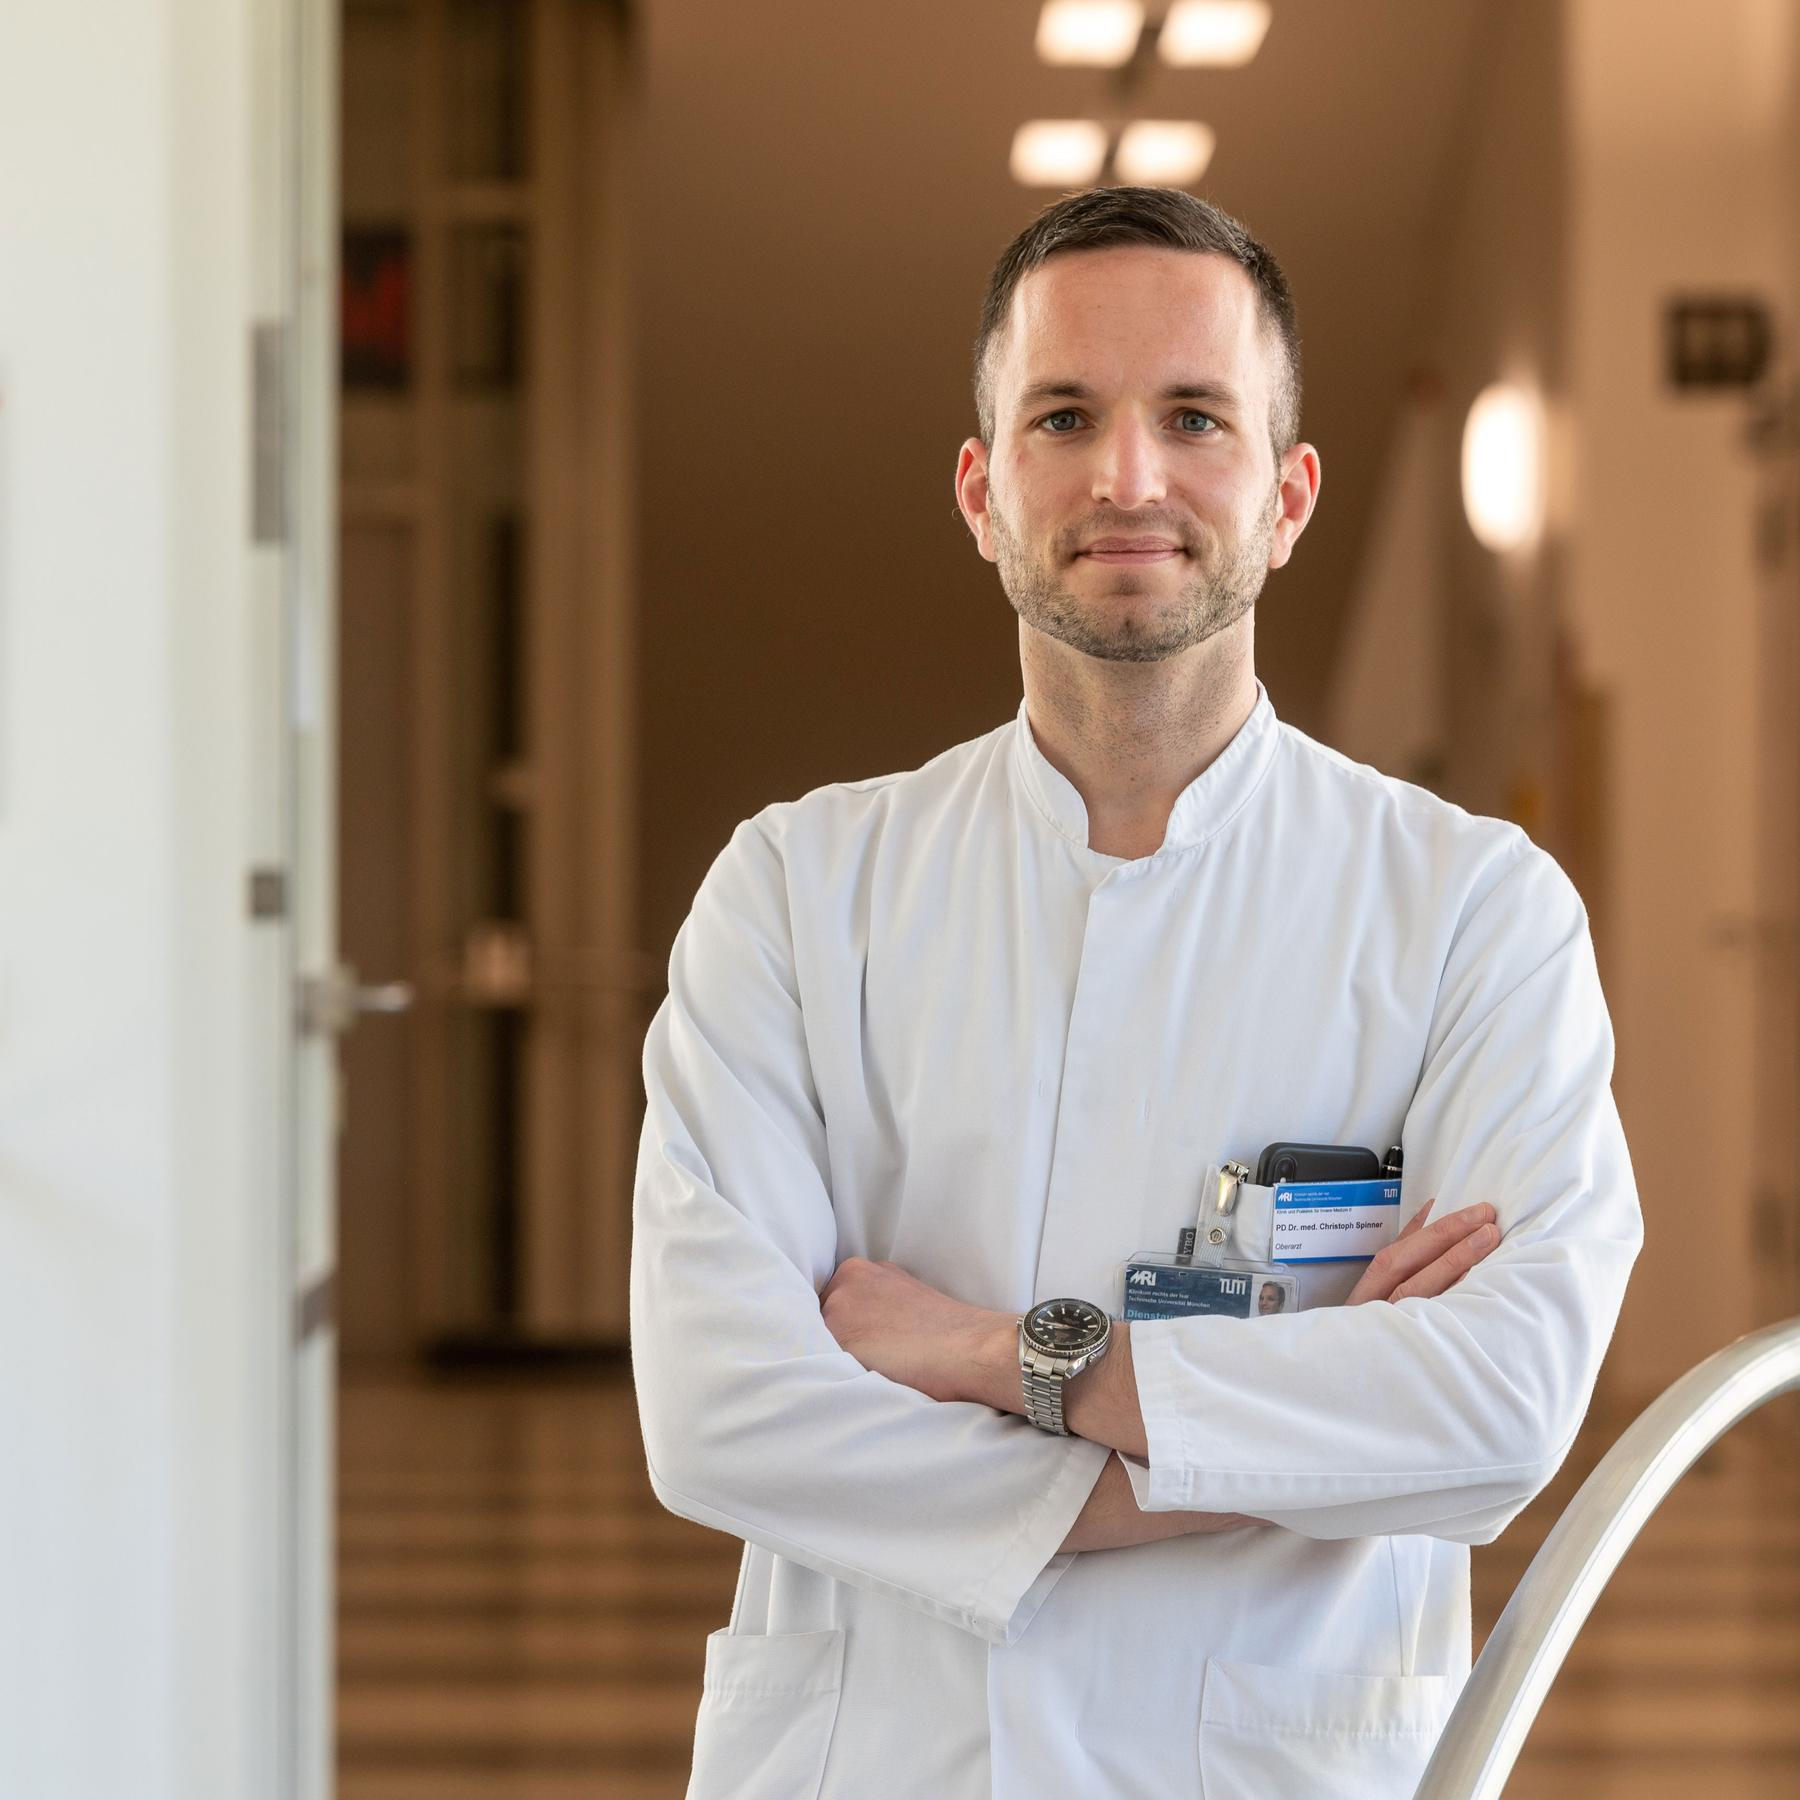 Corona-News mit Dr. Christoph Spinner (06.07.2021)